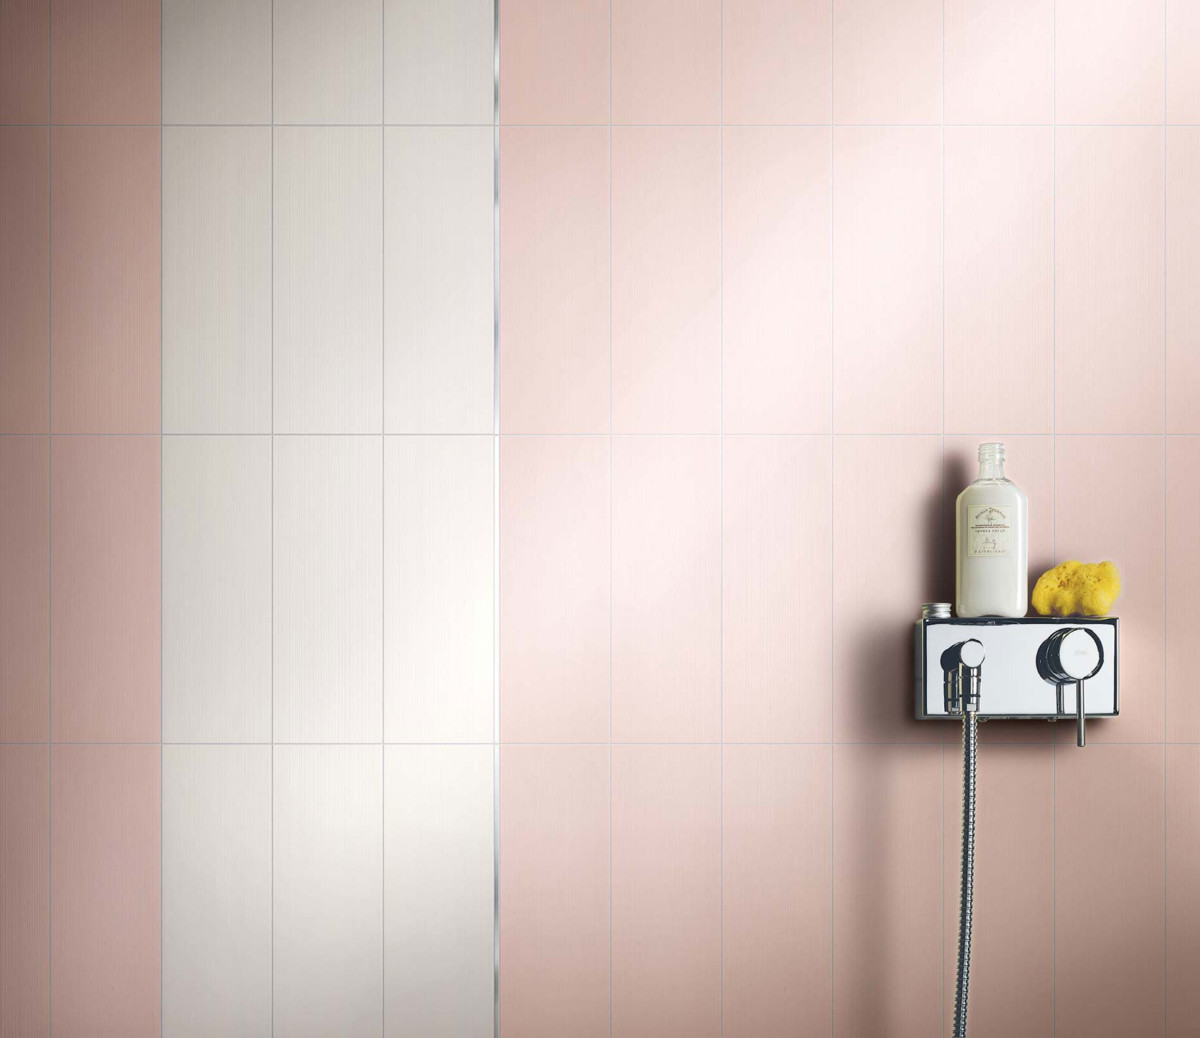 banos-rosa-tendencia decoracion